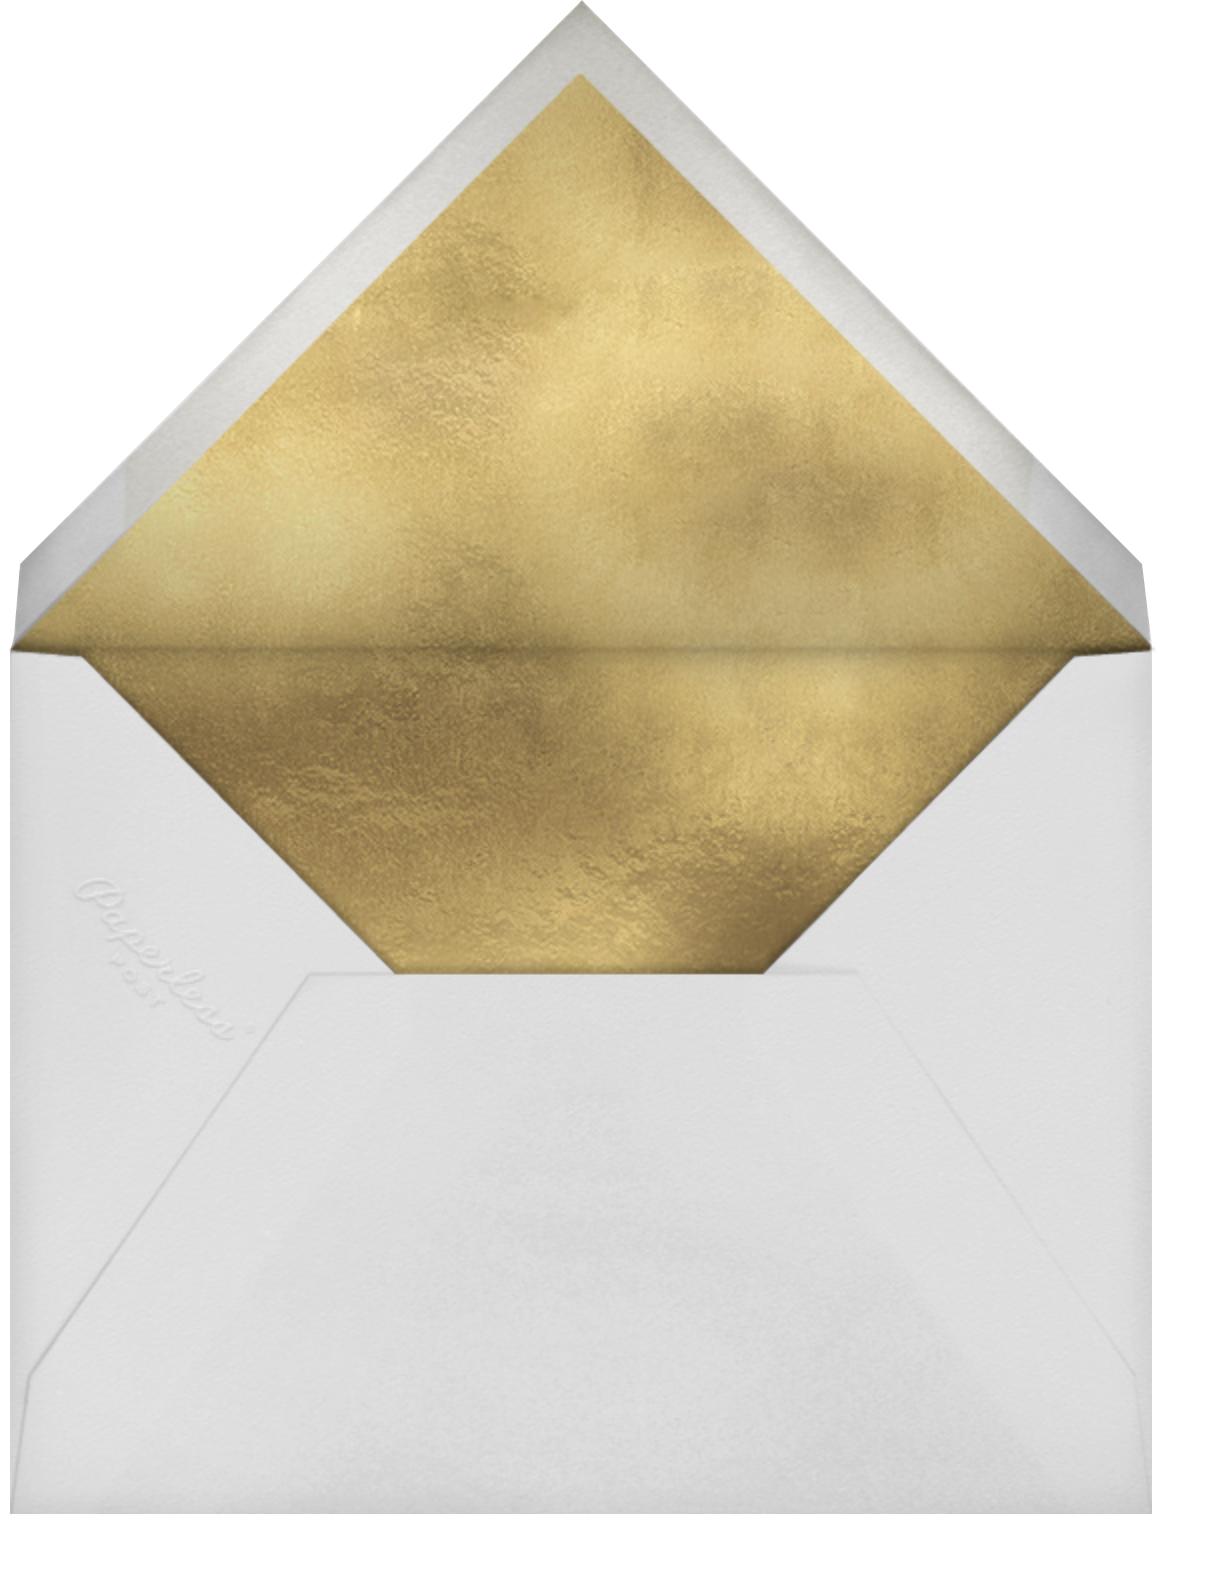 Castle Confetti - Mr. Boddington's Studio - Kids' birthday - envelope back